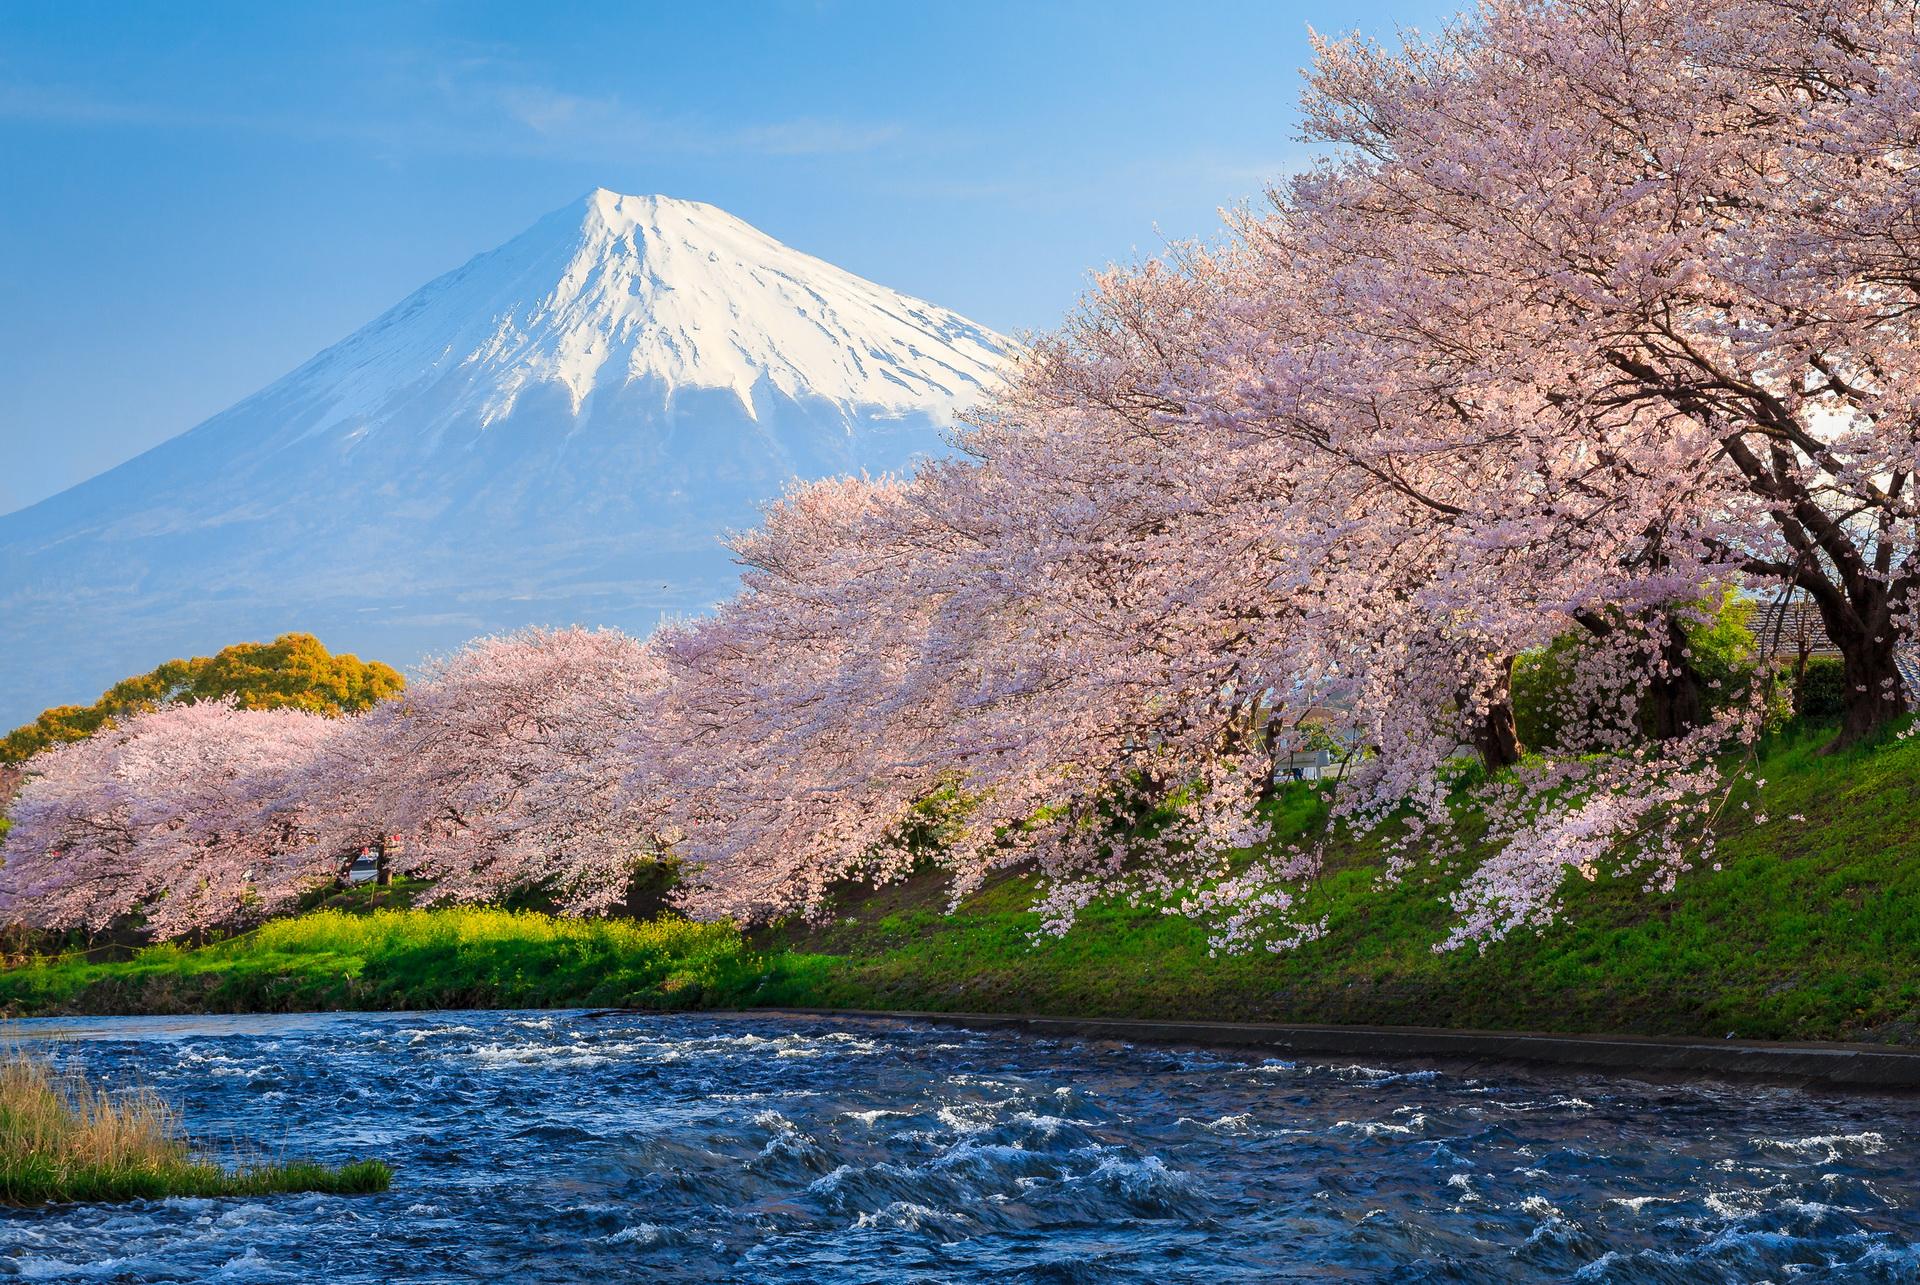 Mount Fuji Wallpaper 19   1920 X 1285 stmednet 1920x1285